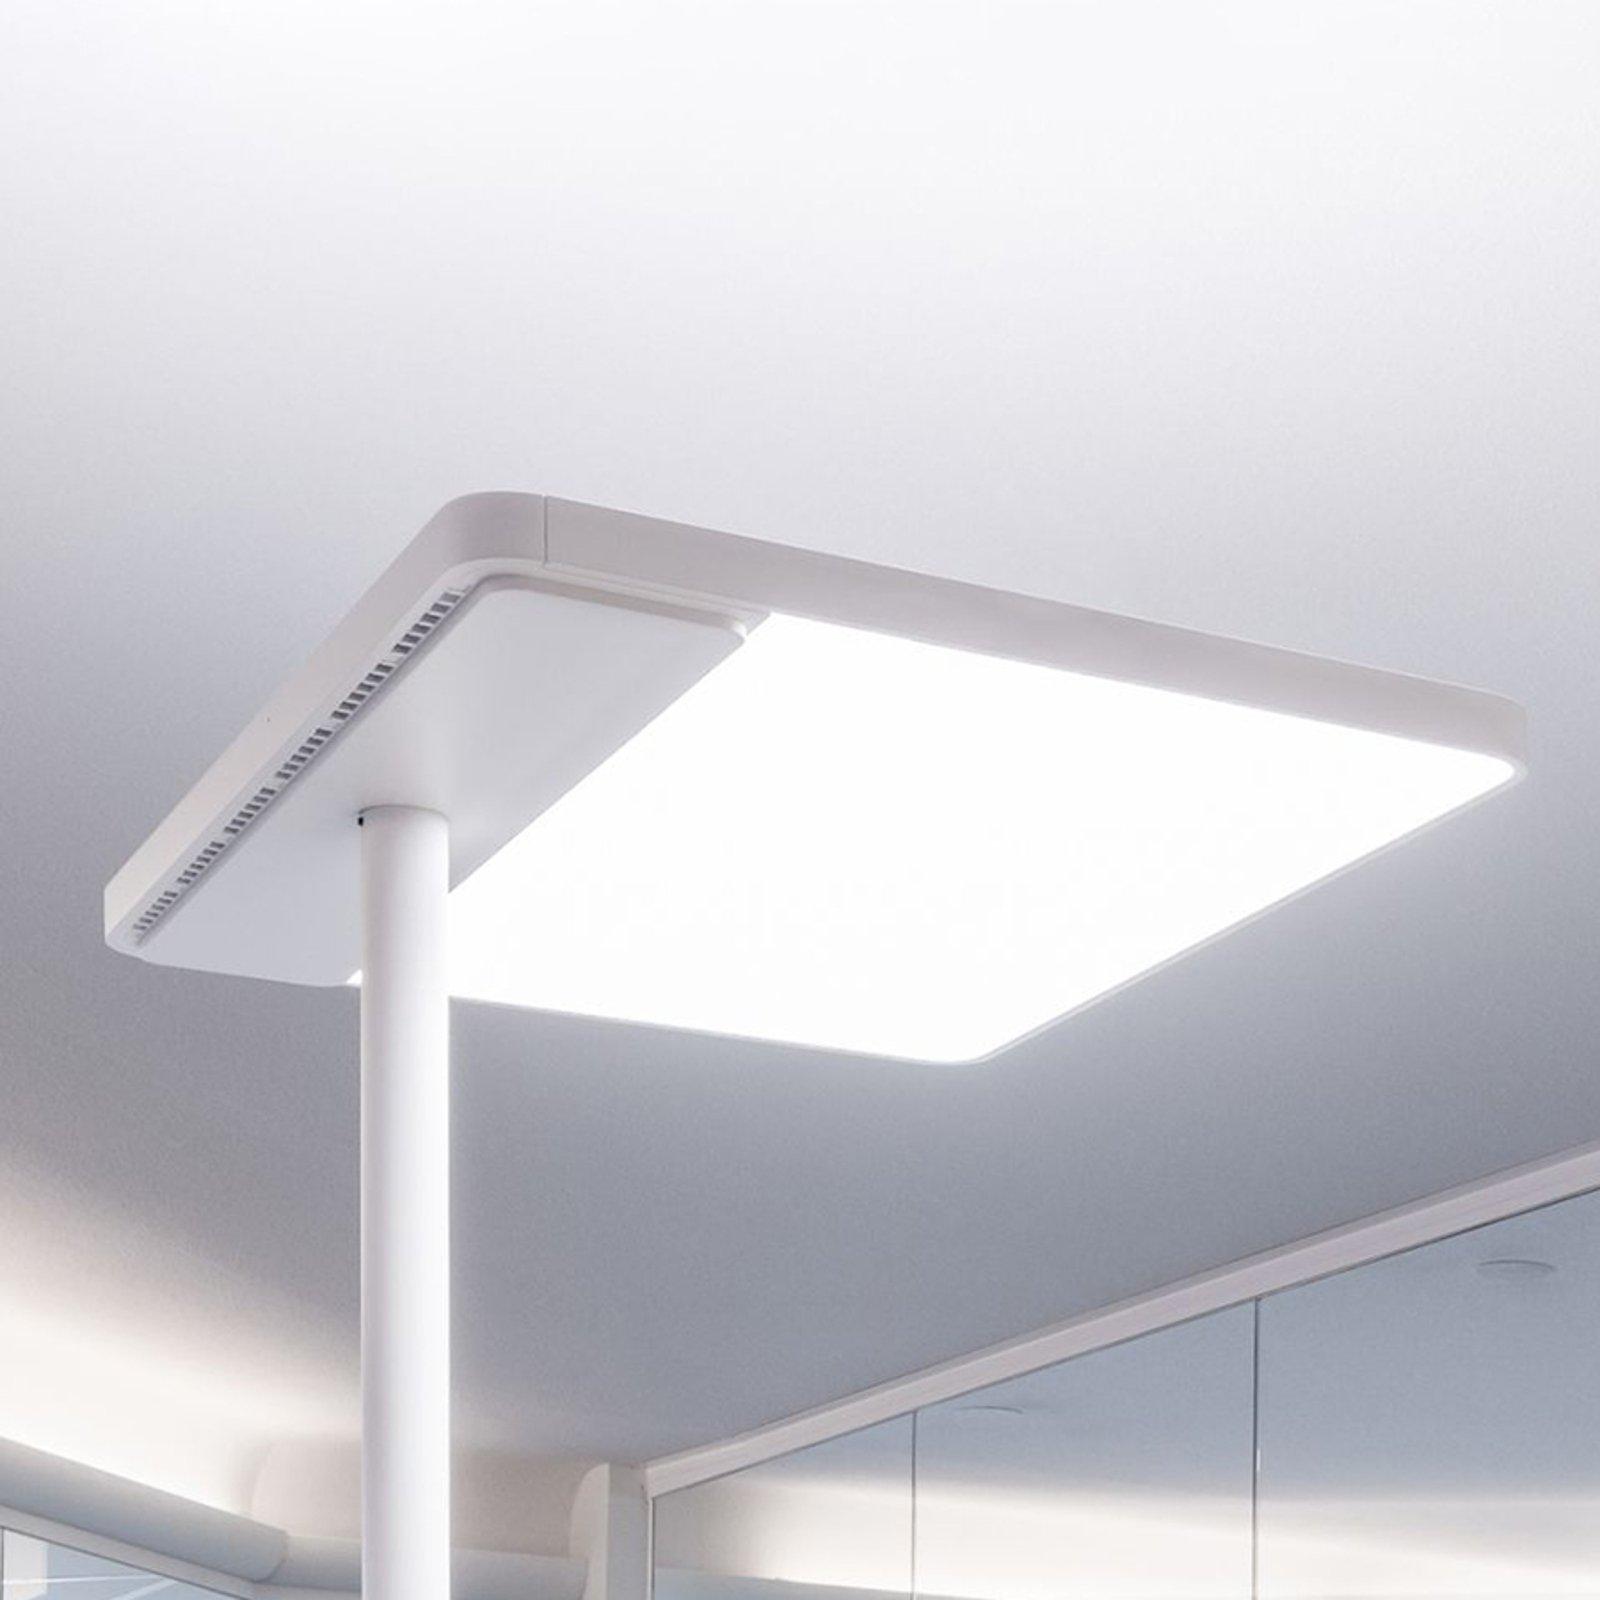 Linea-F LED-gulvlampe til kontor, med tastedimmer